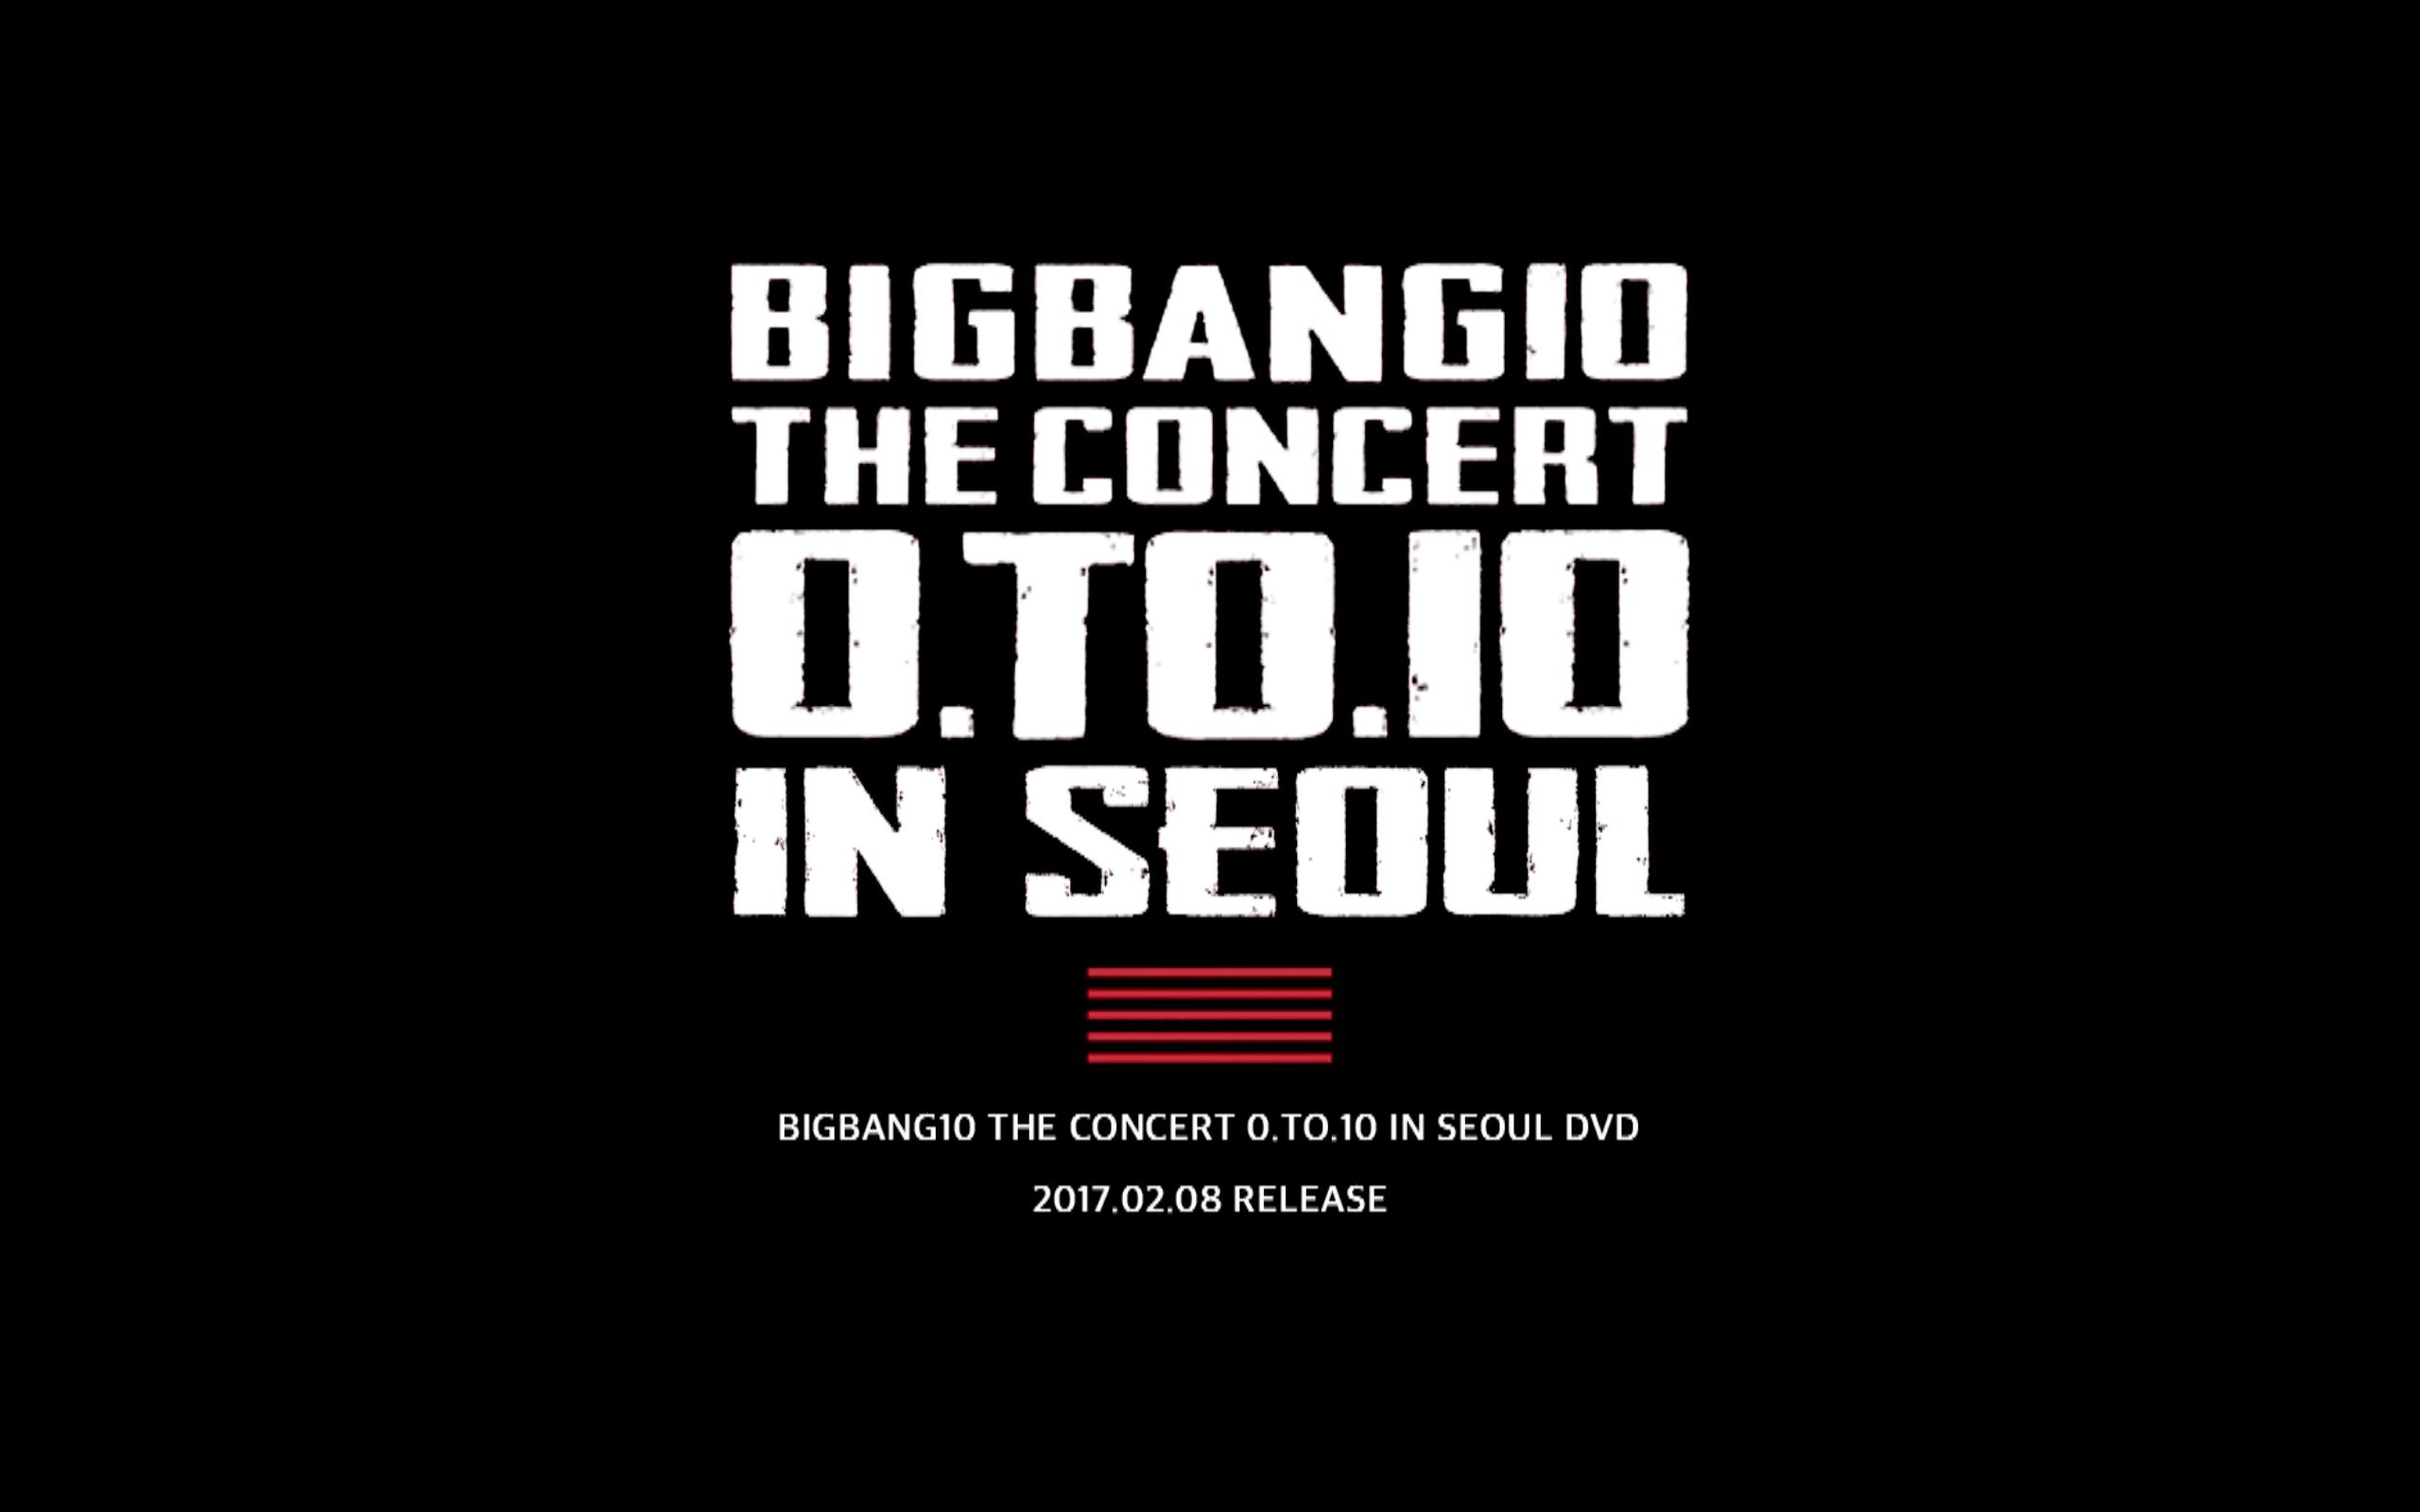 BIGBANG10 THE CONCERT 0.TO.10 IN SEOUL DVD